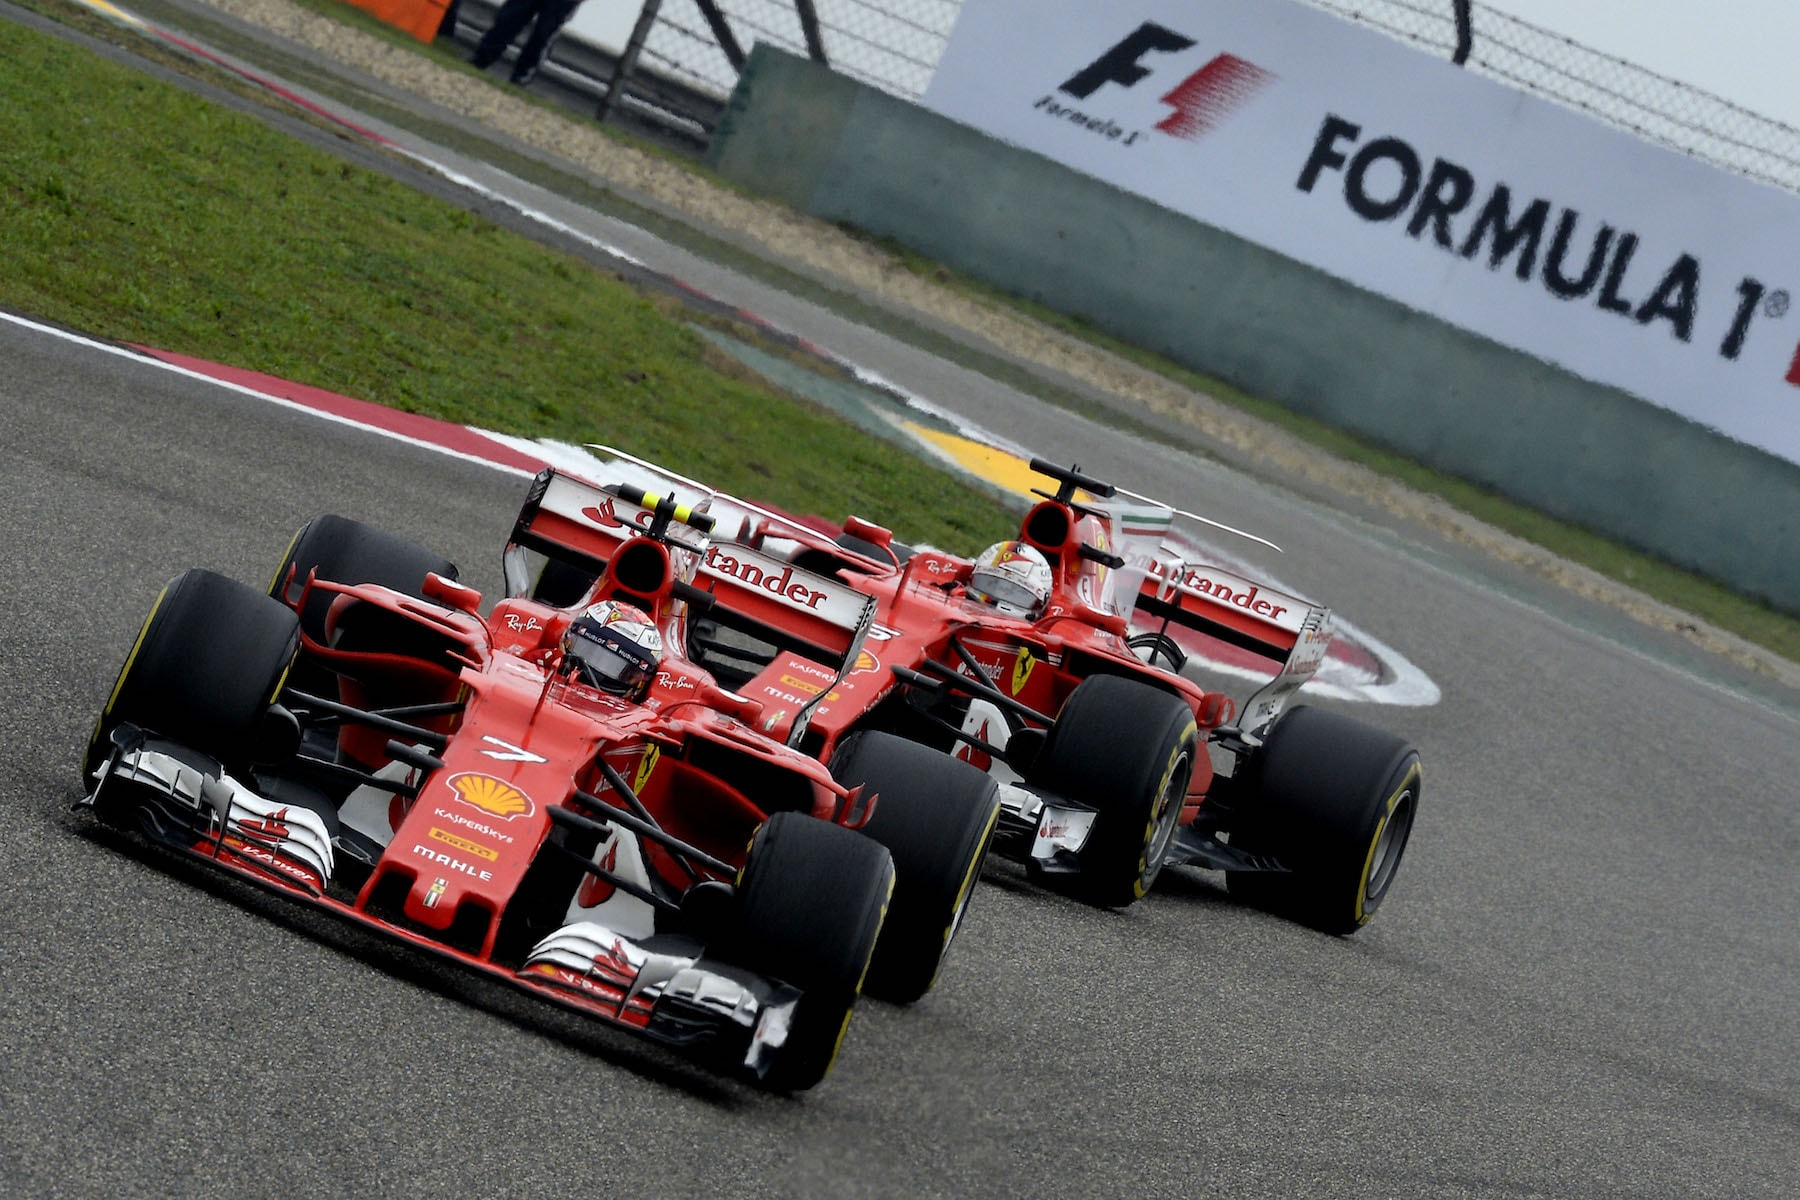 J 2017 Kimi Raikkonen and Sebastian Vettel | Ferrari SF70H | 2017 Chinese GP P5 1 copy.jpg